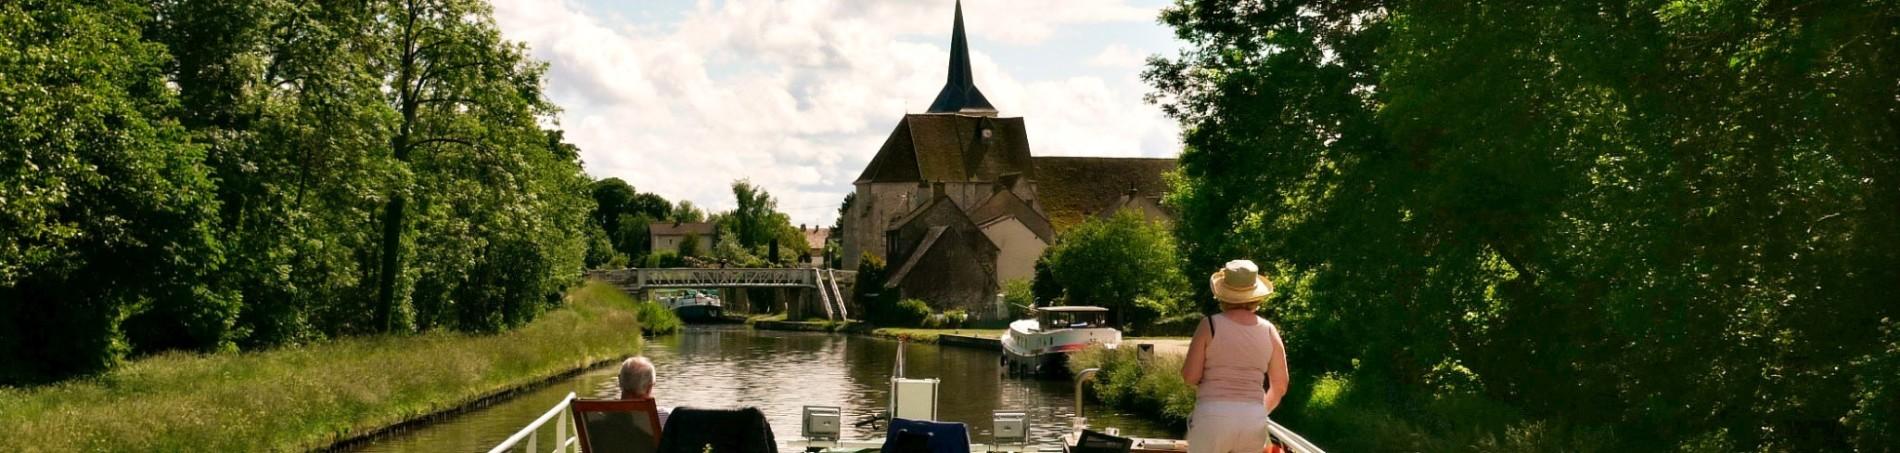 Aankomst in Montbouy op het kanaal van Briare